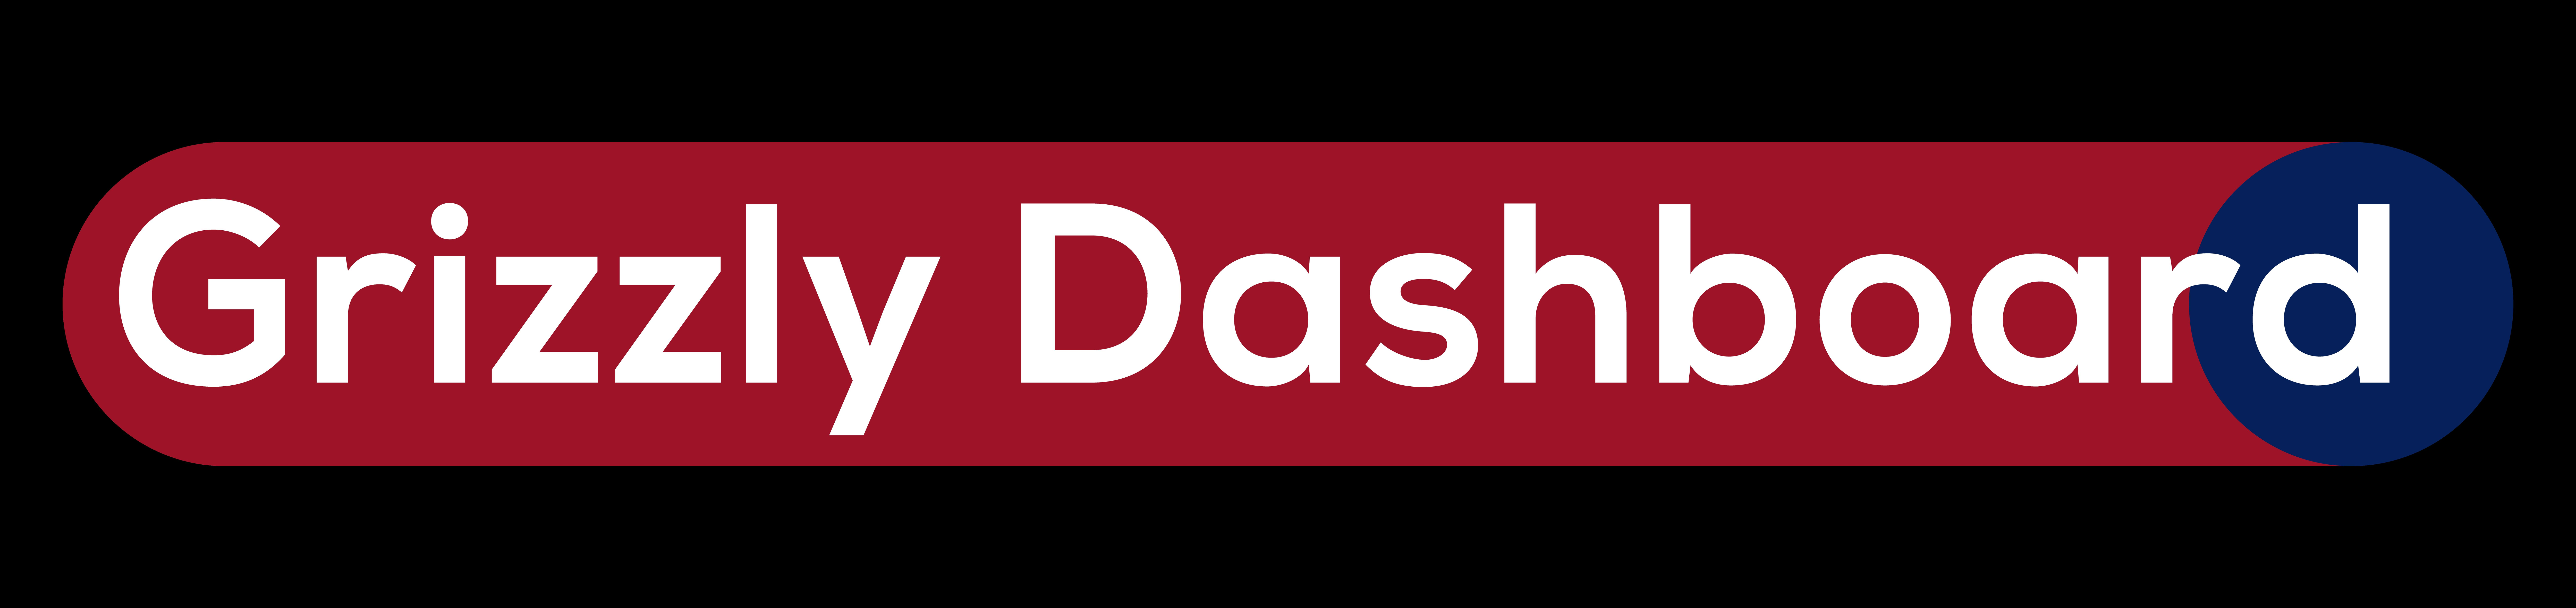 Icono Grizzly Dashboard Color